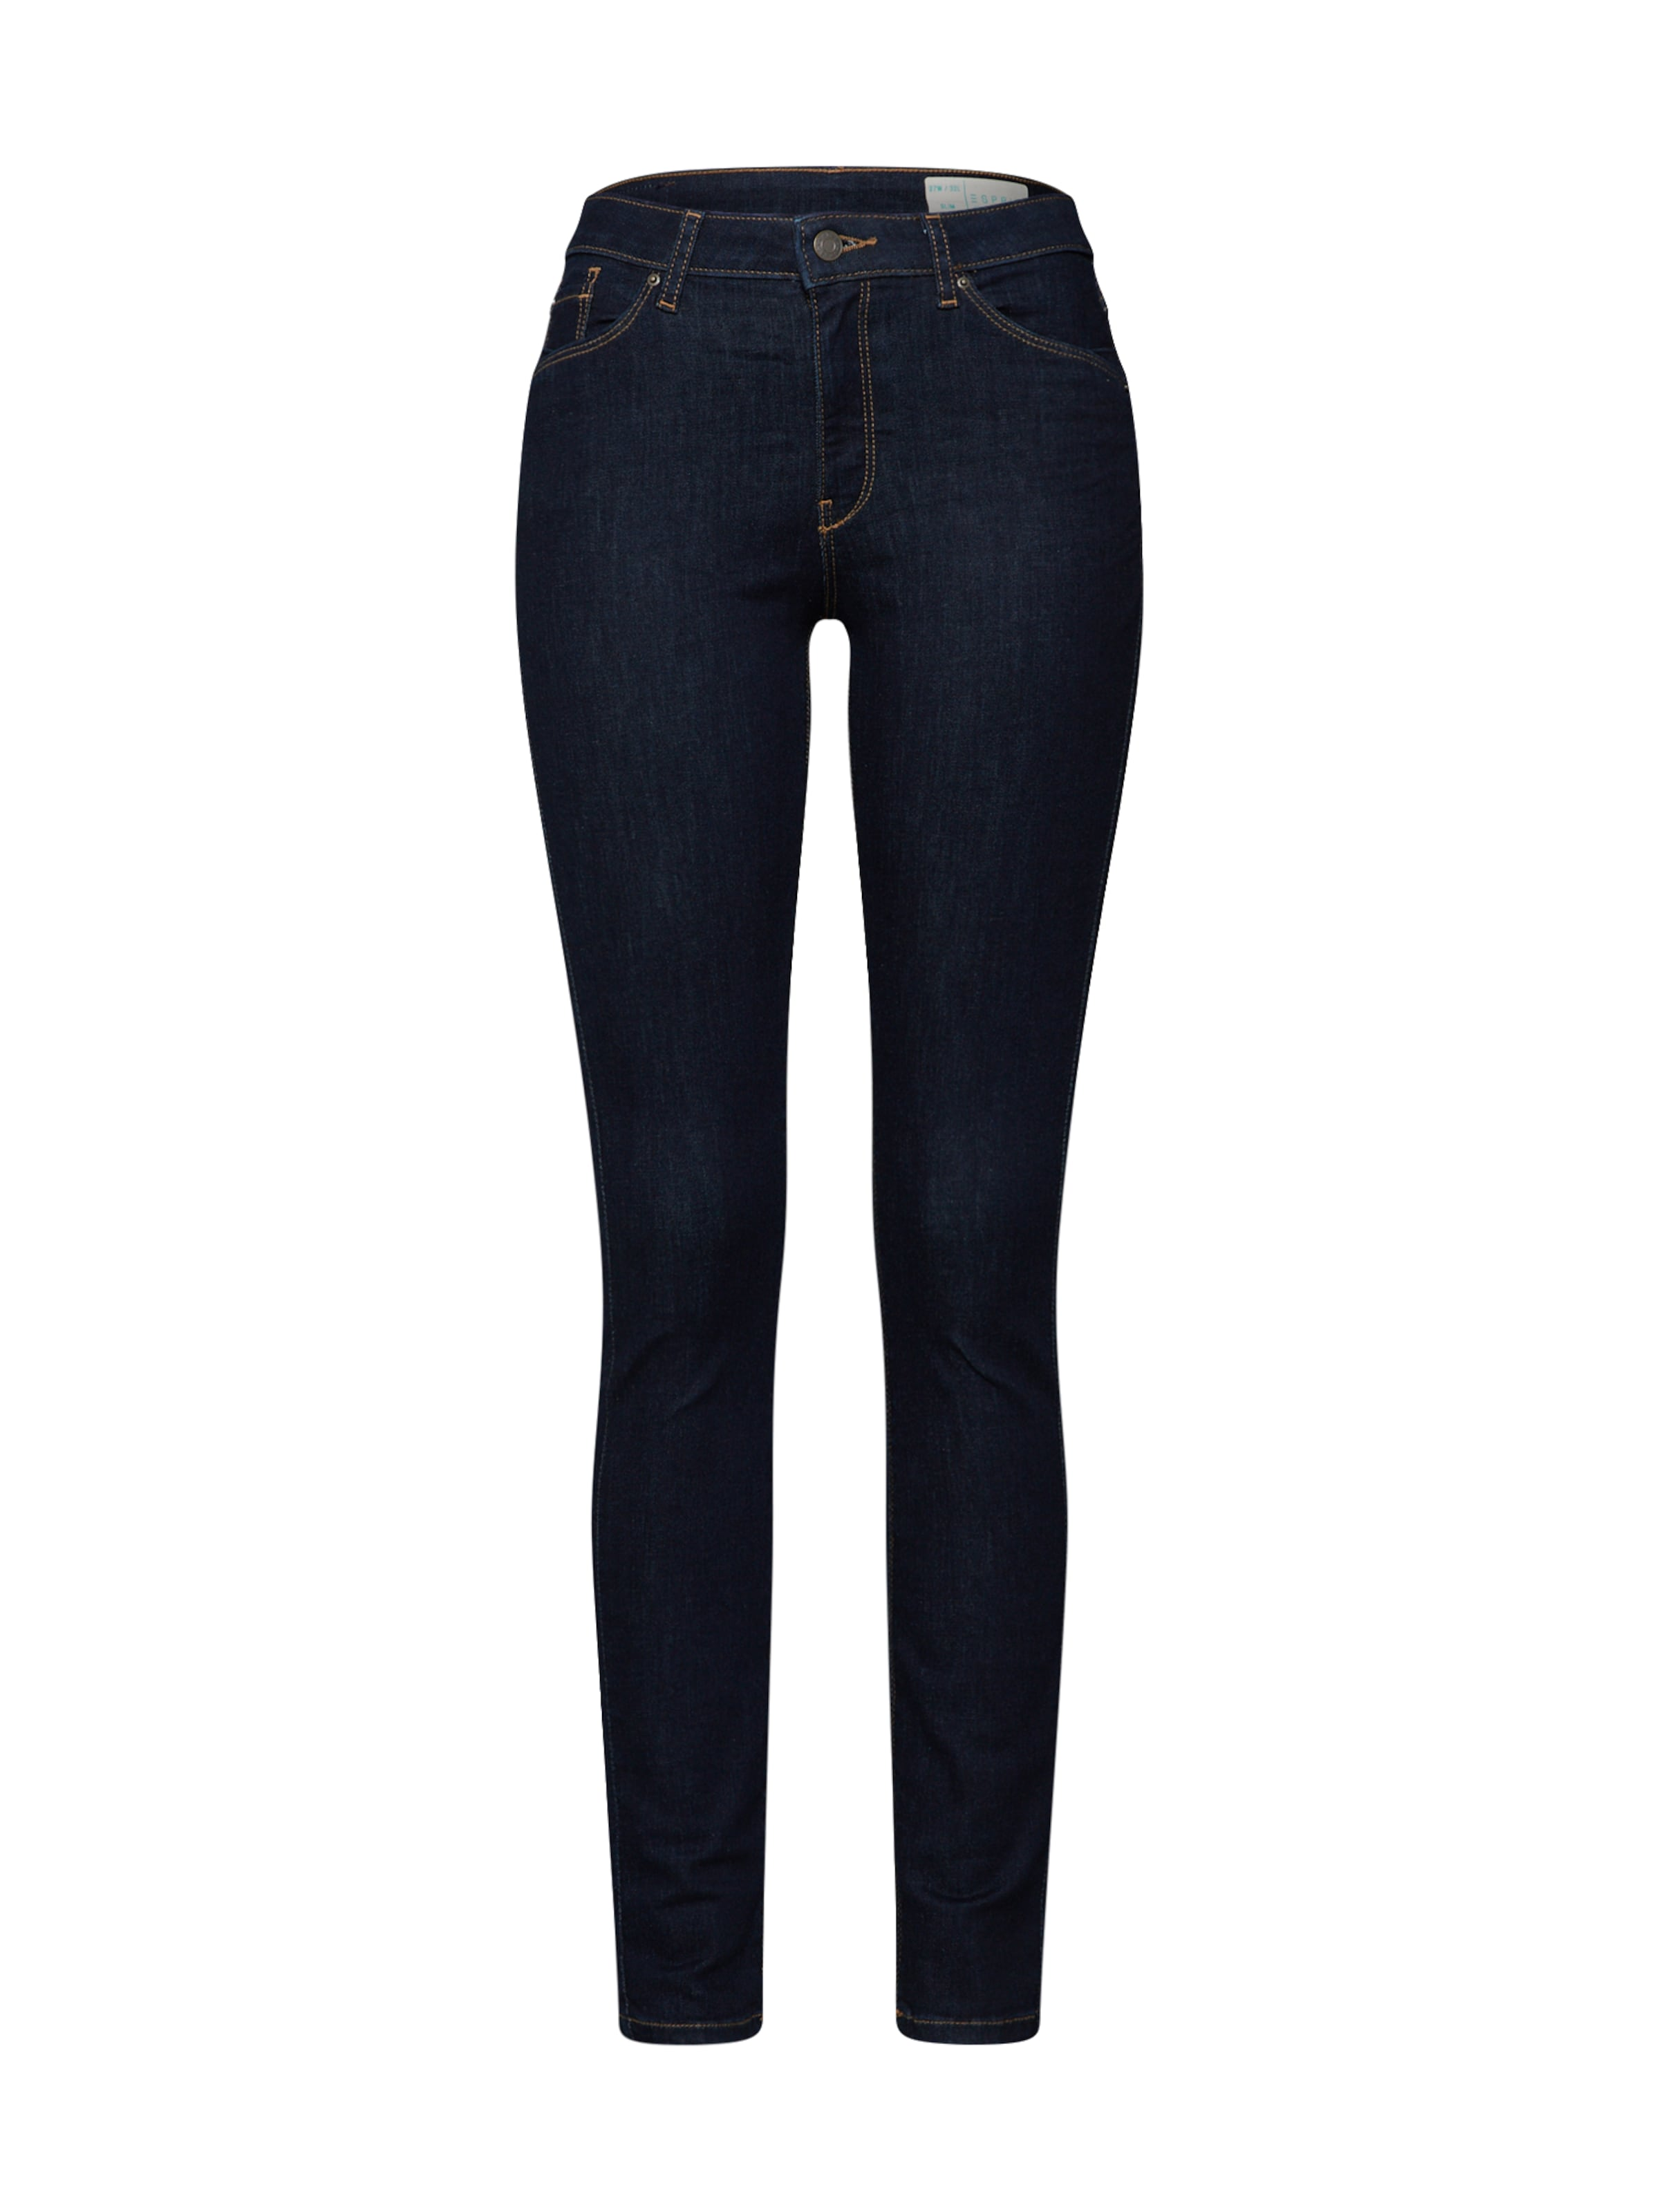 Esprit Esprit Jeans Blue Blue In In Esprit Jeans Denim Denim derCxoB